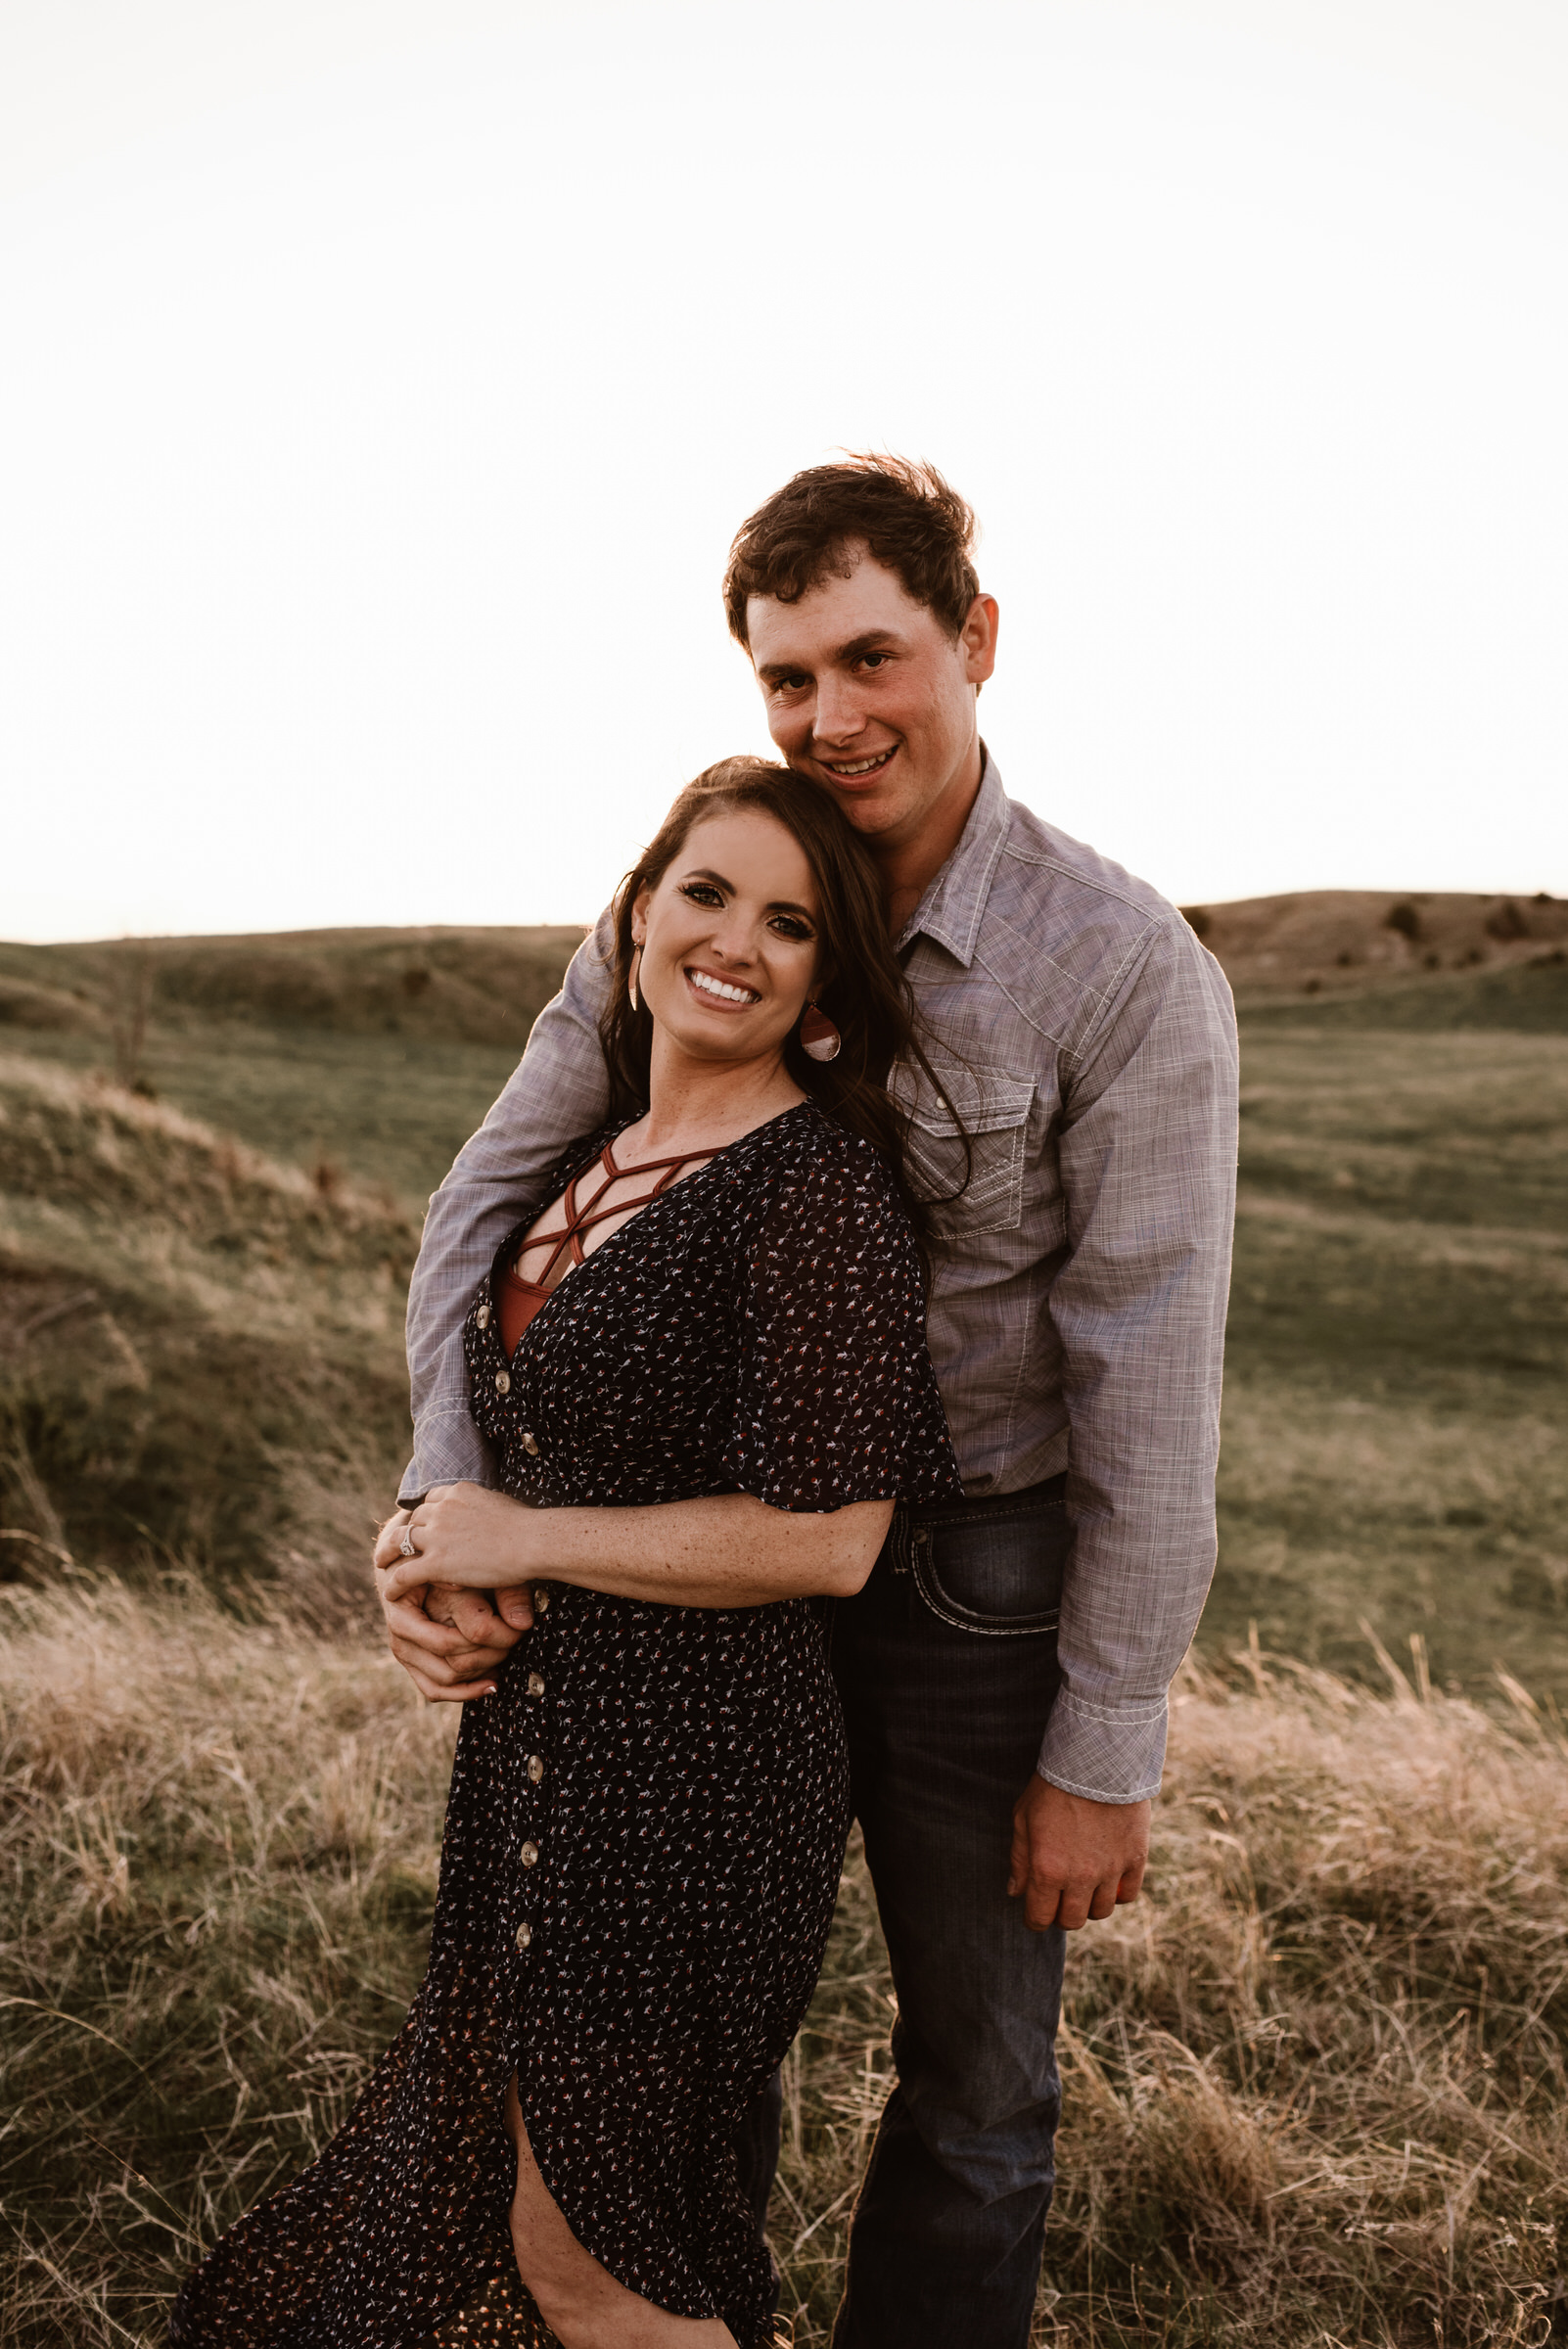 Sandhills-Nebraska-Engagement-Wedding-Photographer-Kaylie-Sirek-Photography-034.jpg